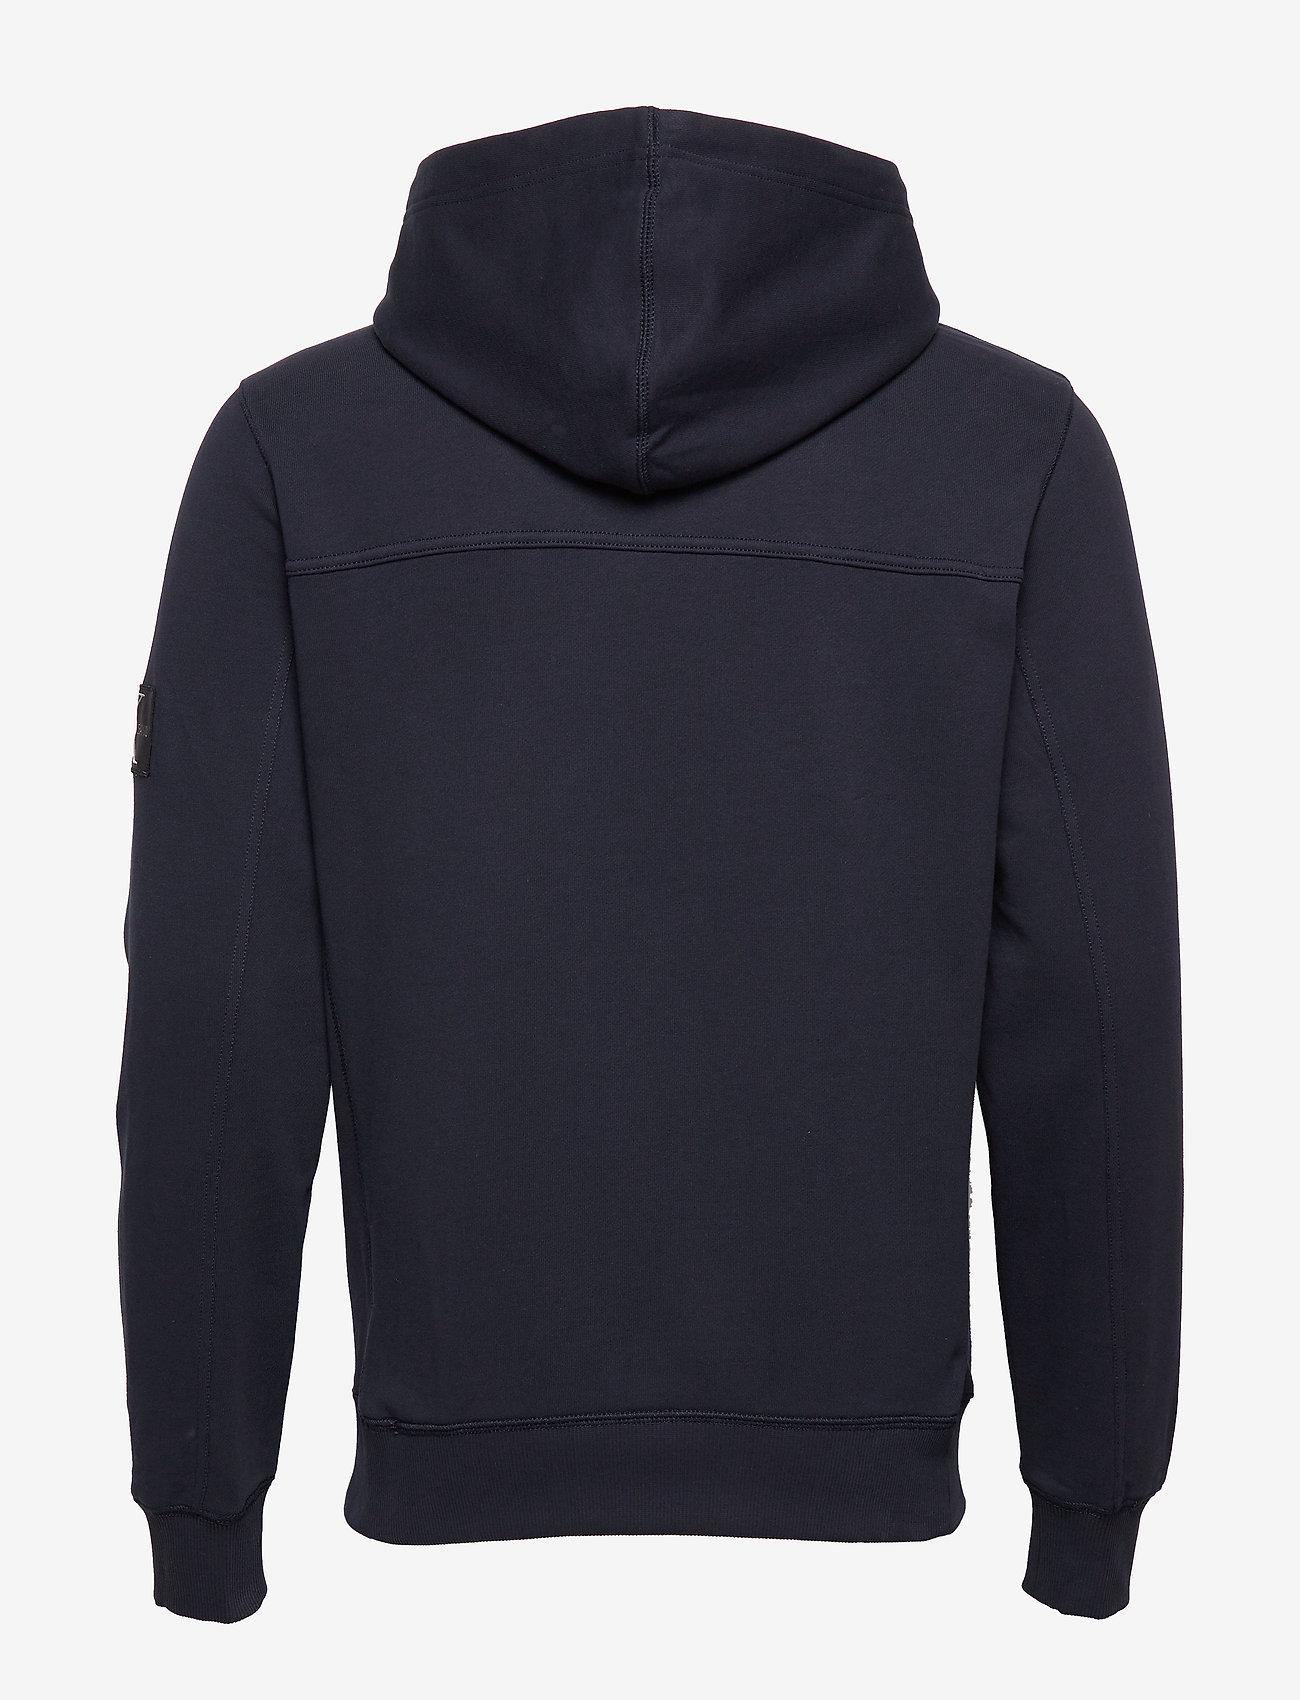 Monogram Sleeve Badg (Night Sky) - Calvin Klein Jeans TJkAr6